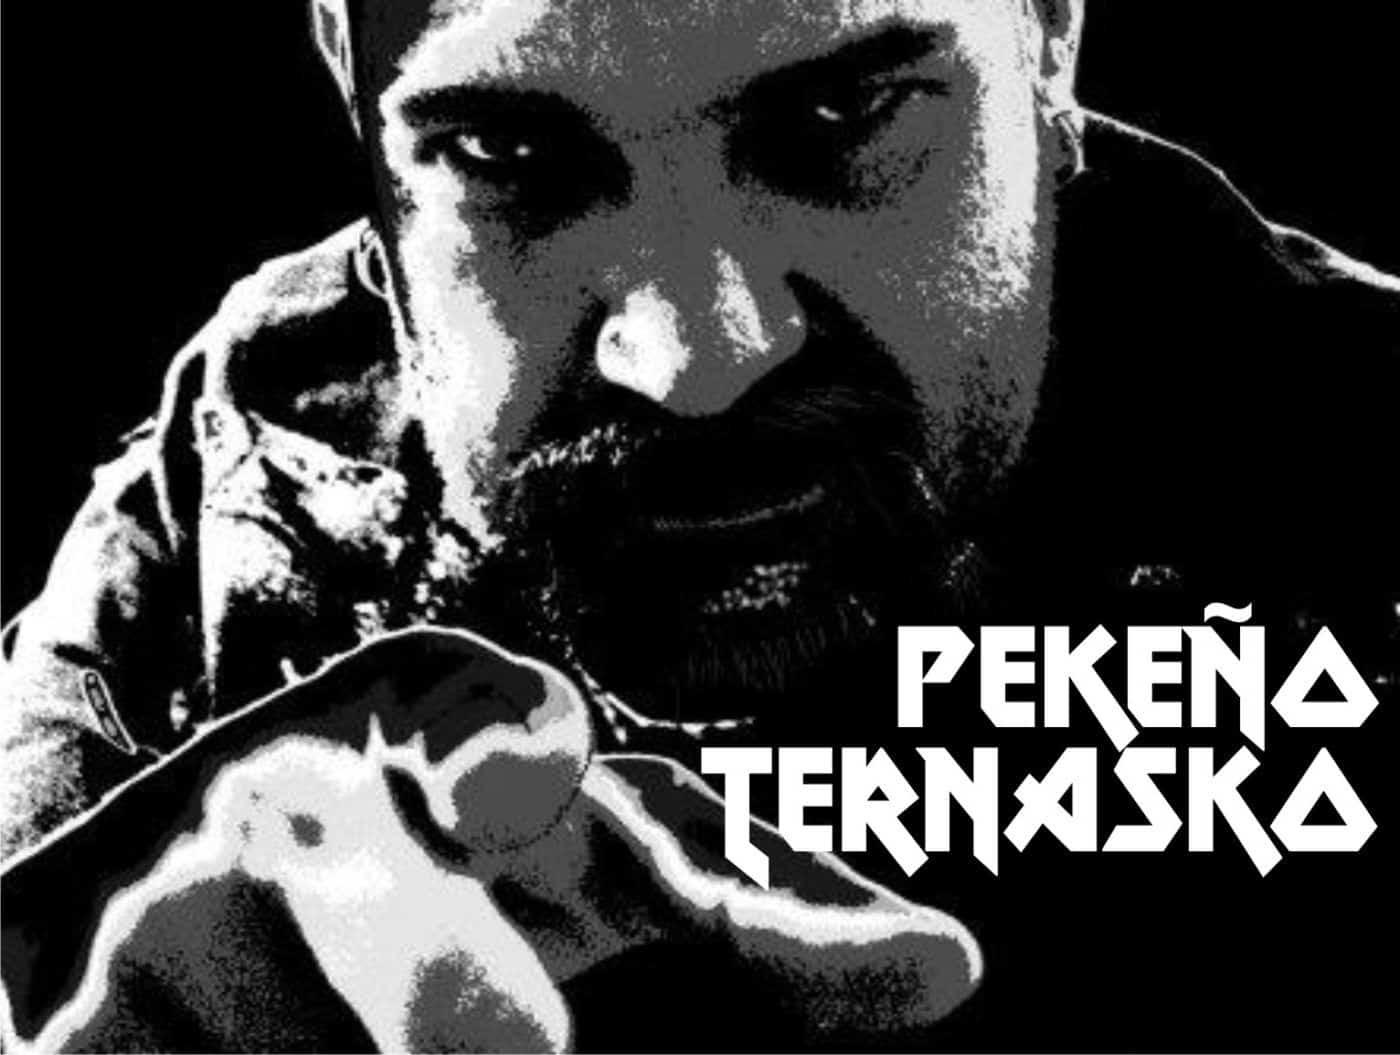 Pekeño Ternasko 032: Pinche palabra de dios